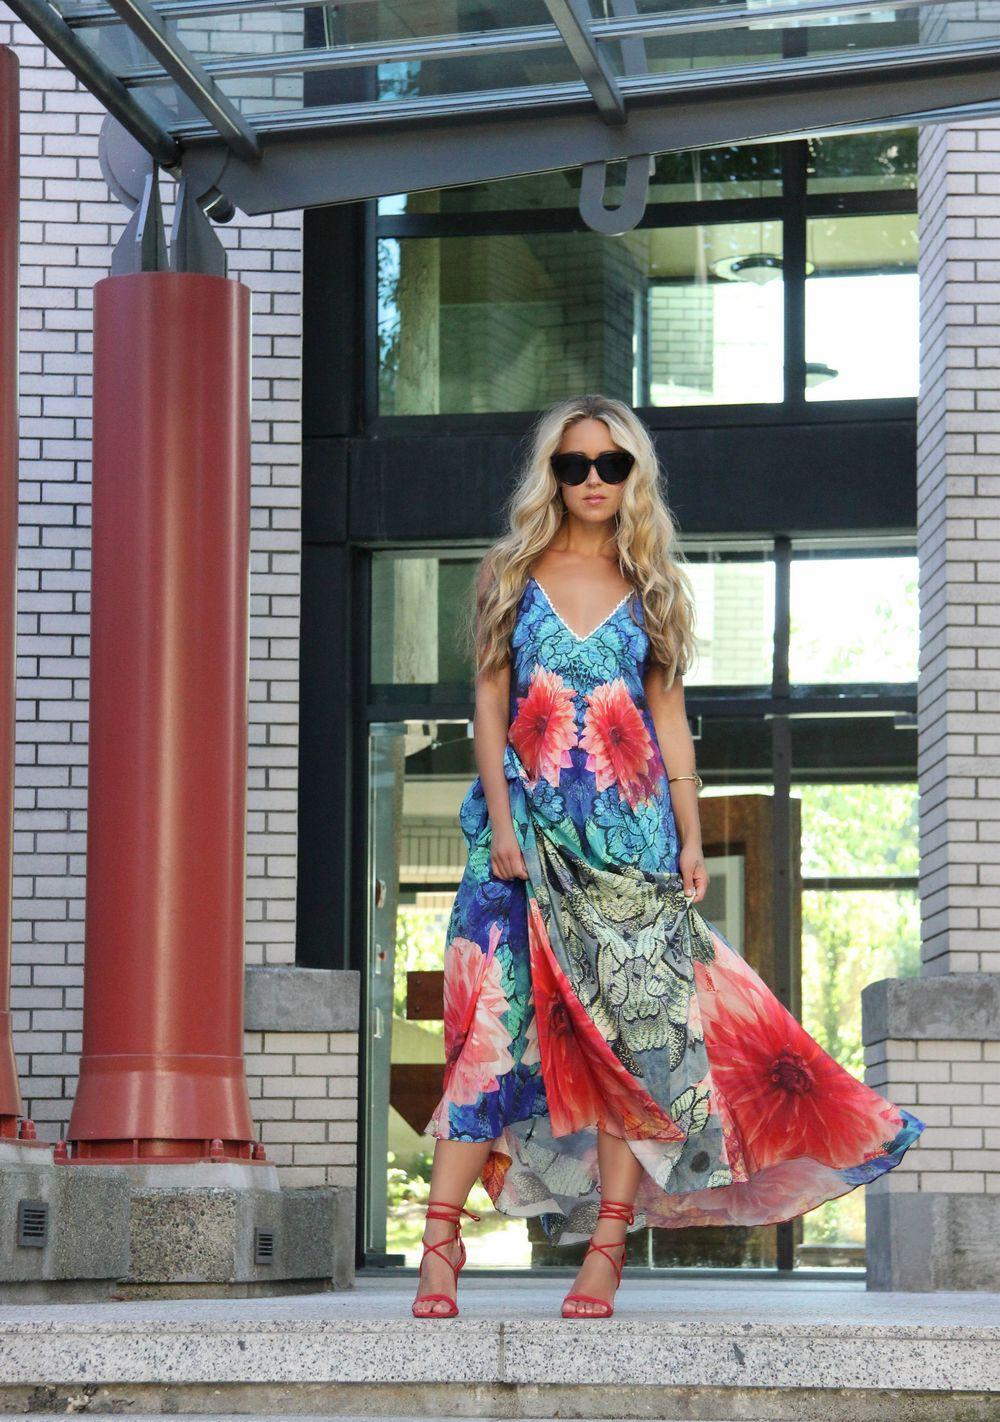 Wearing Athena Procopiou Dress and WXYZBracelet via Wardrobe Apparel